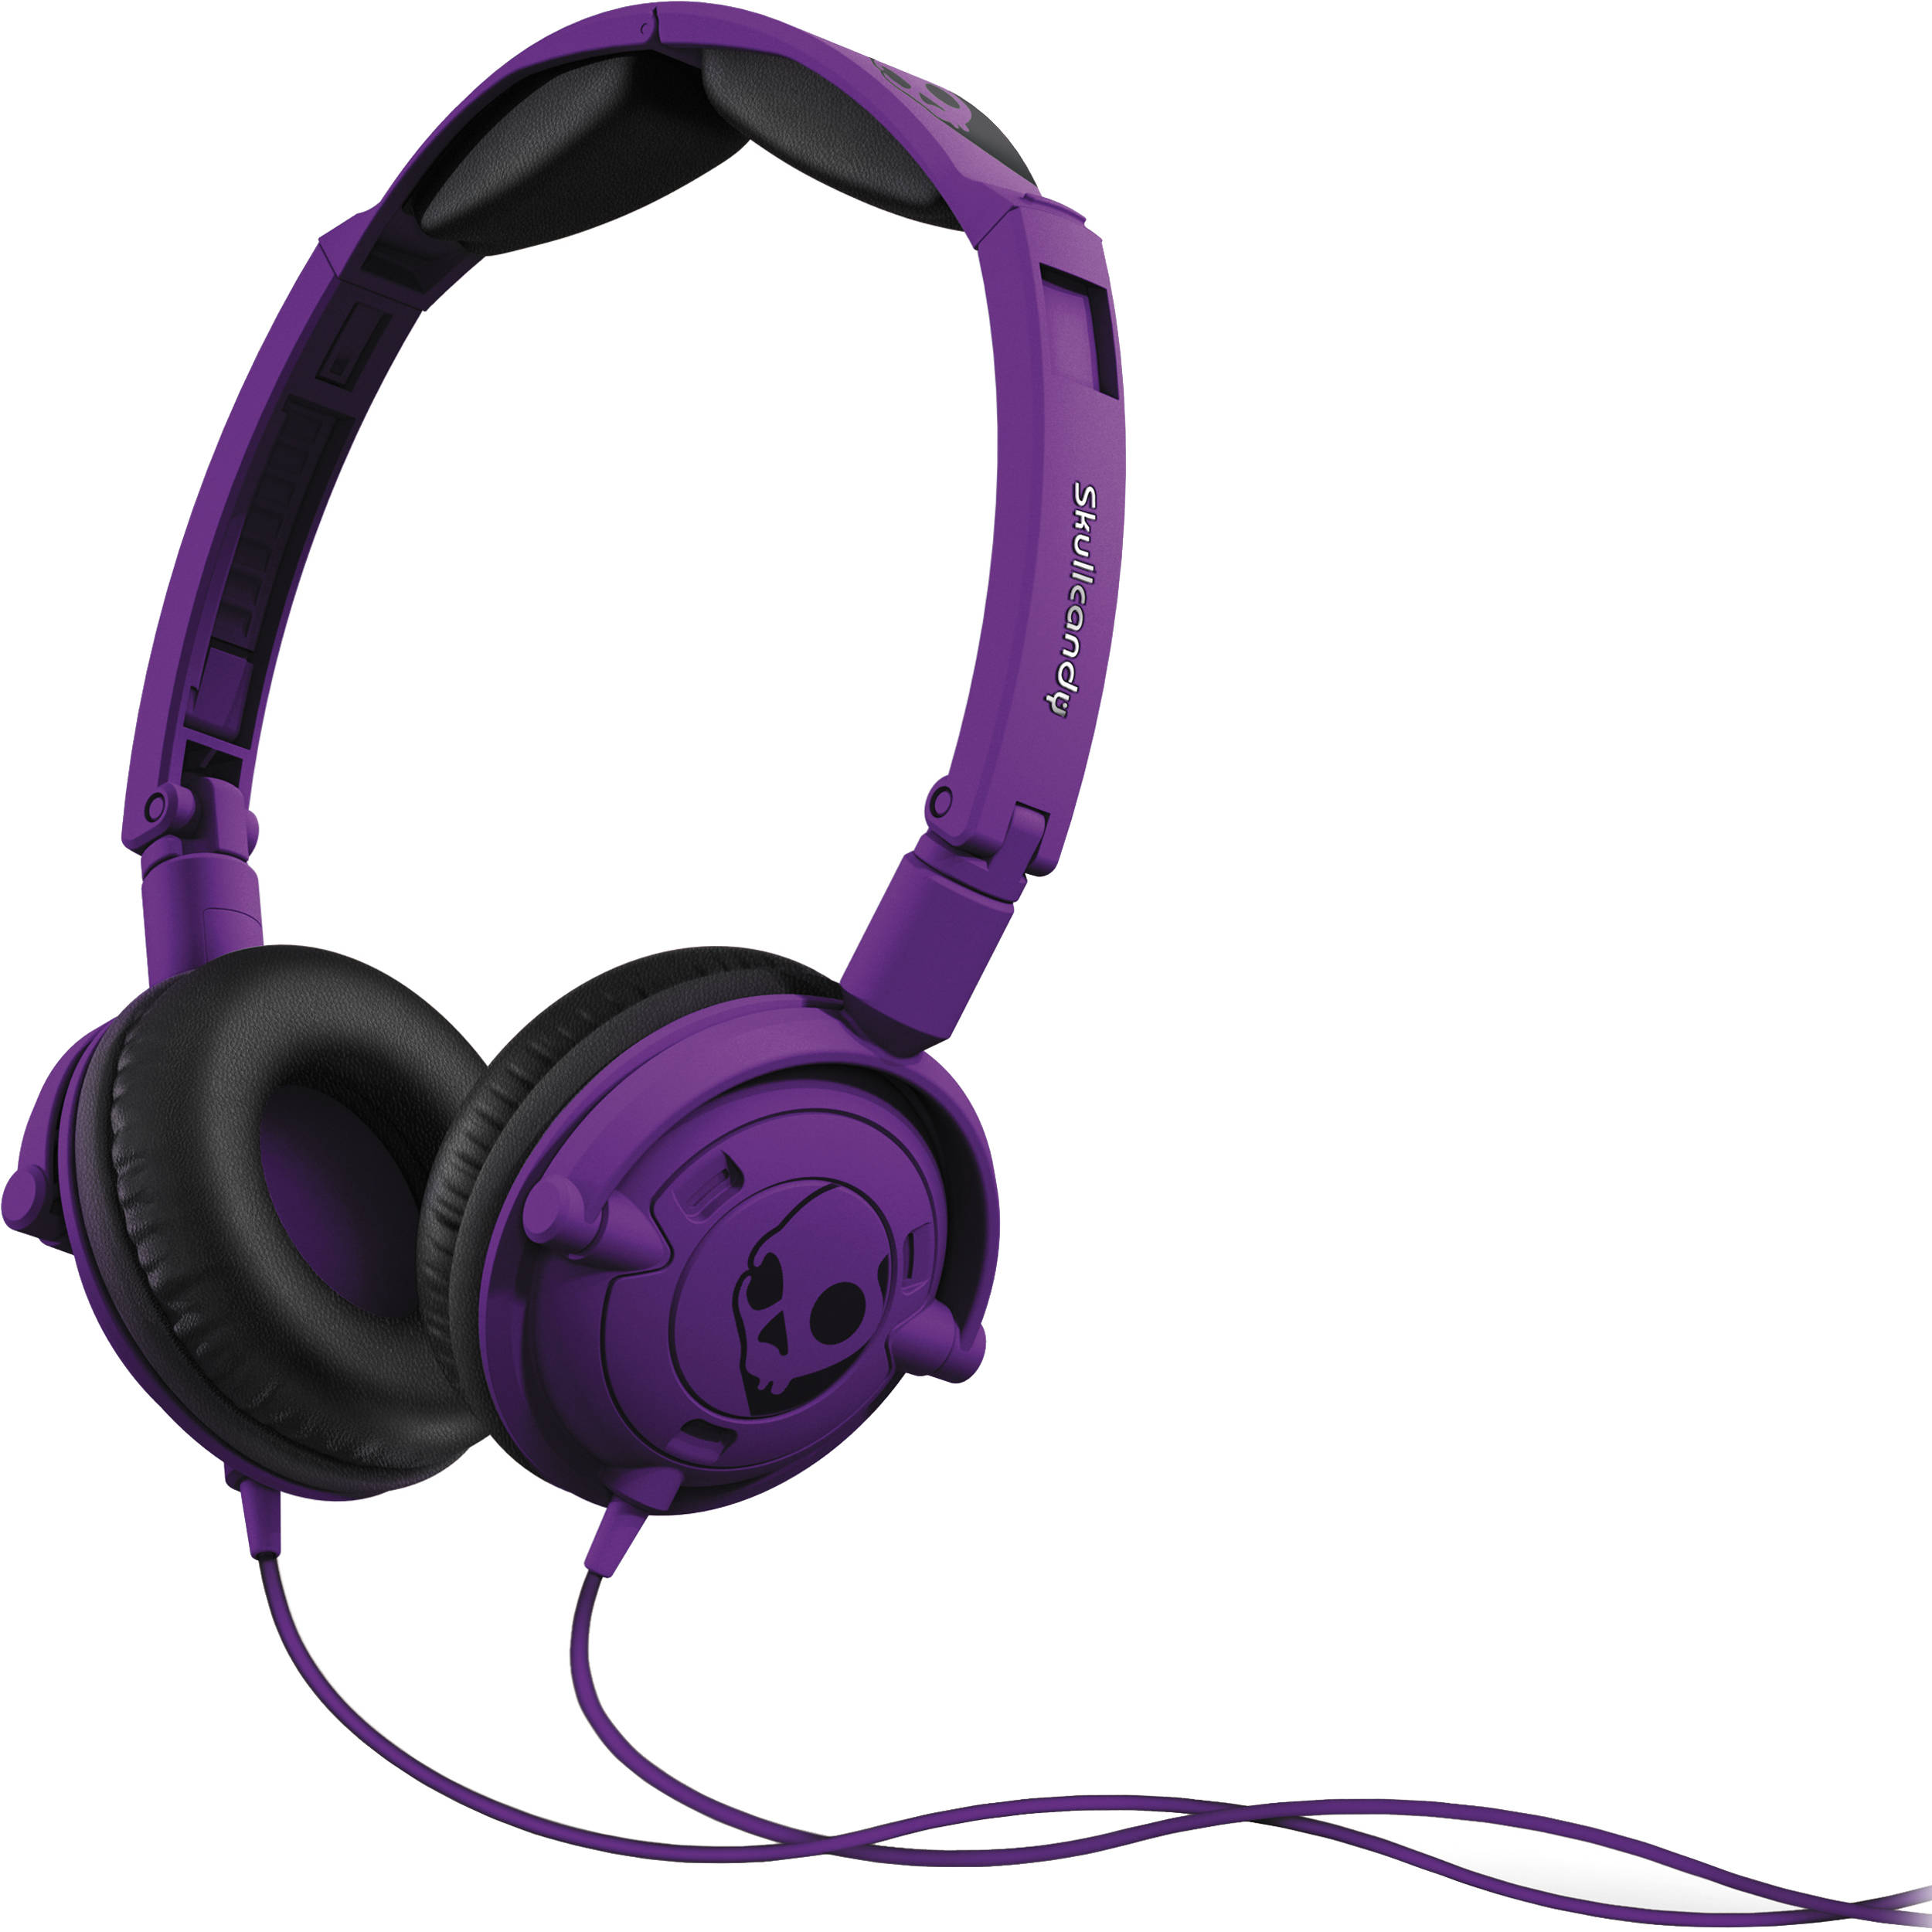 how to connect elinz headphones to my ohone